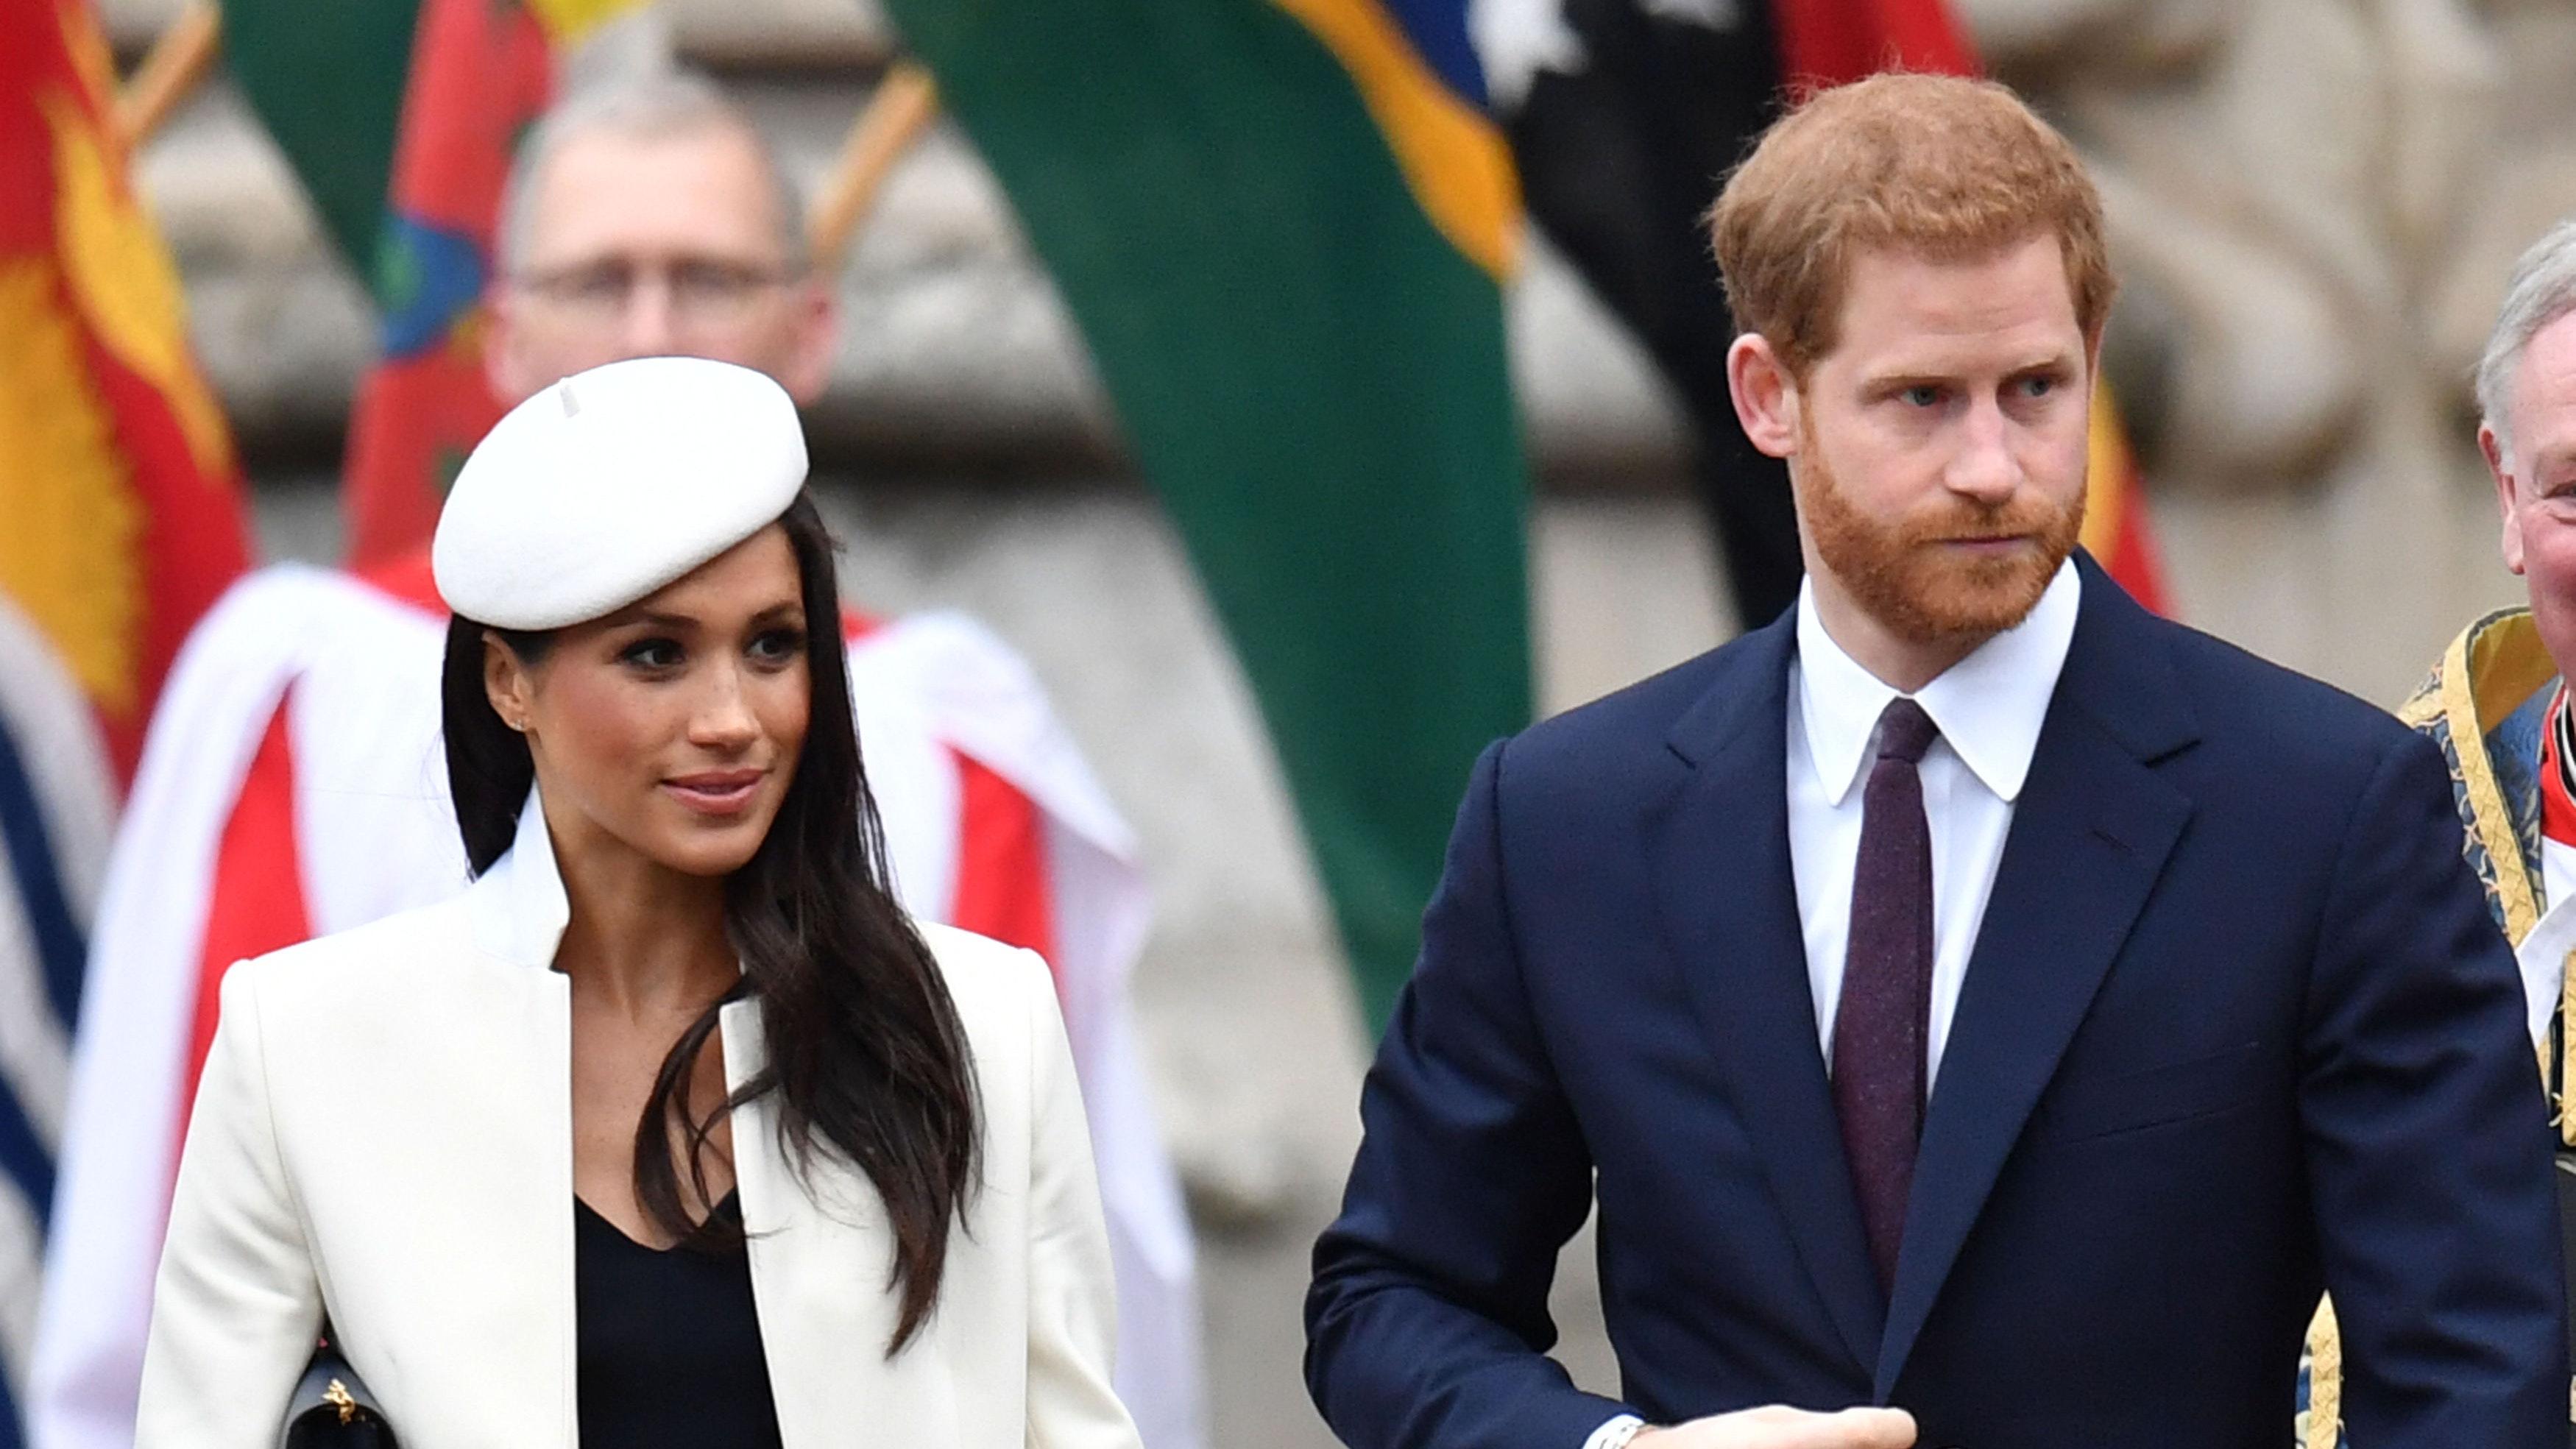 La boda real de Meghan Markle y Harry homenajeará a Lady Di